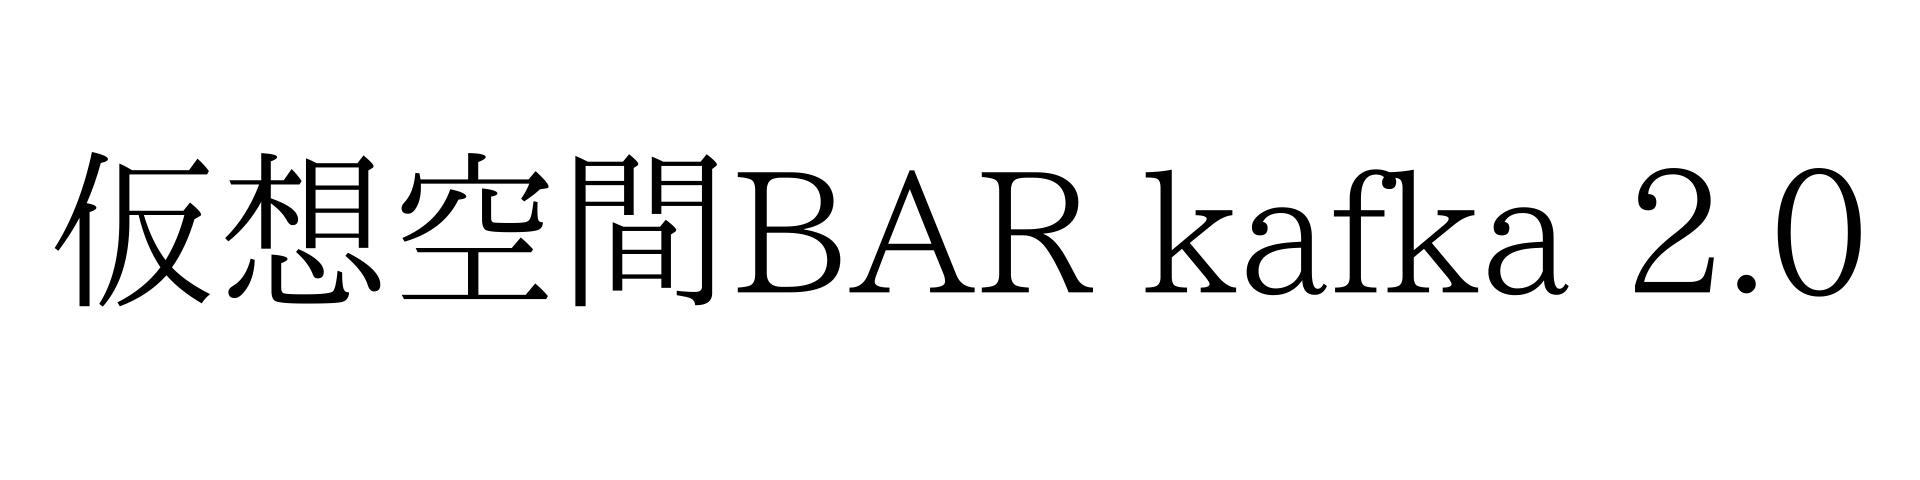 仮想空間BAR kafka 2.0